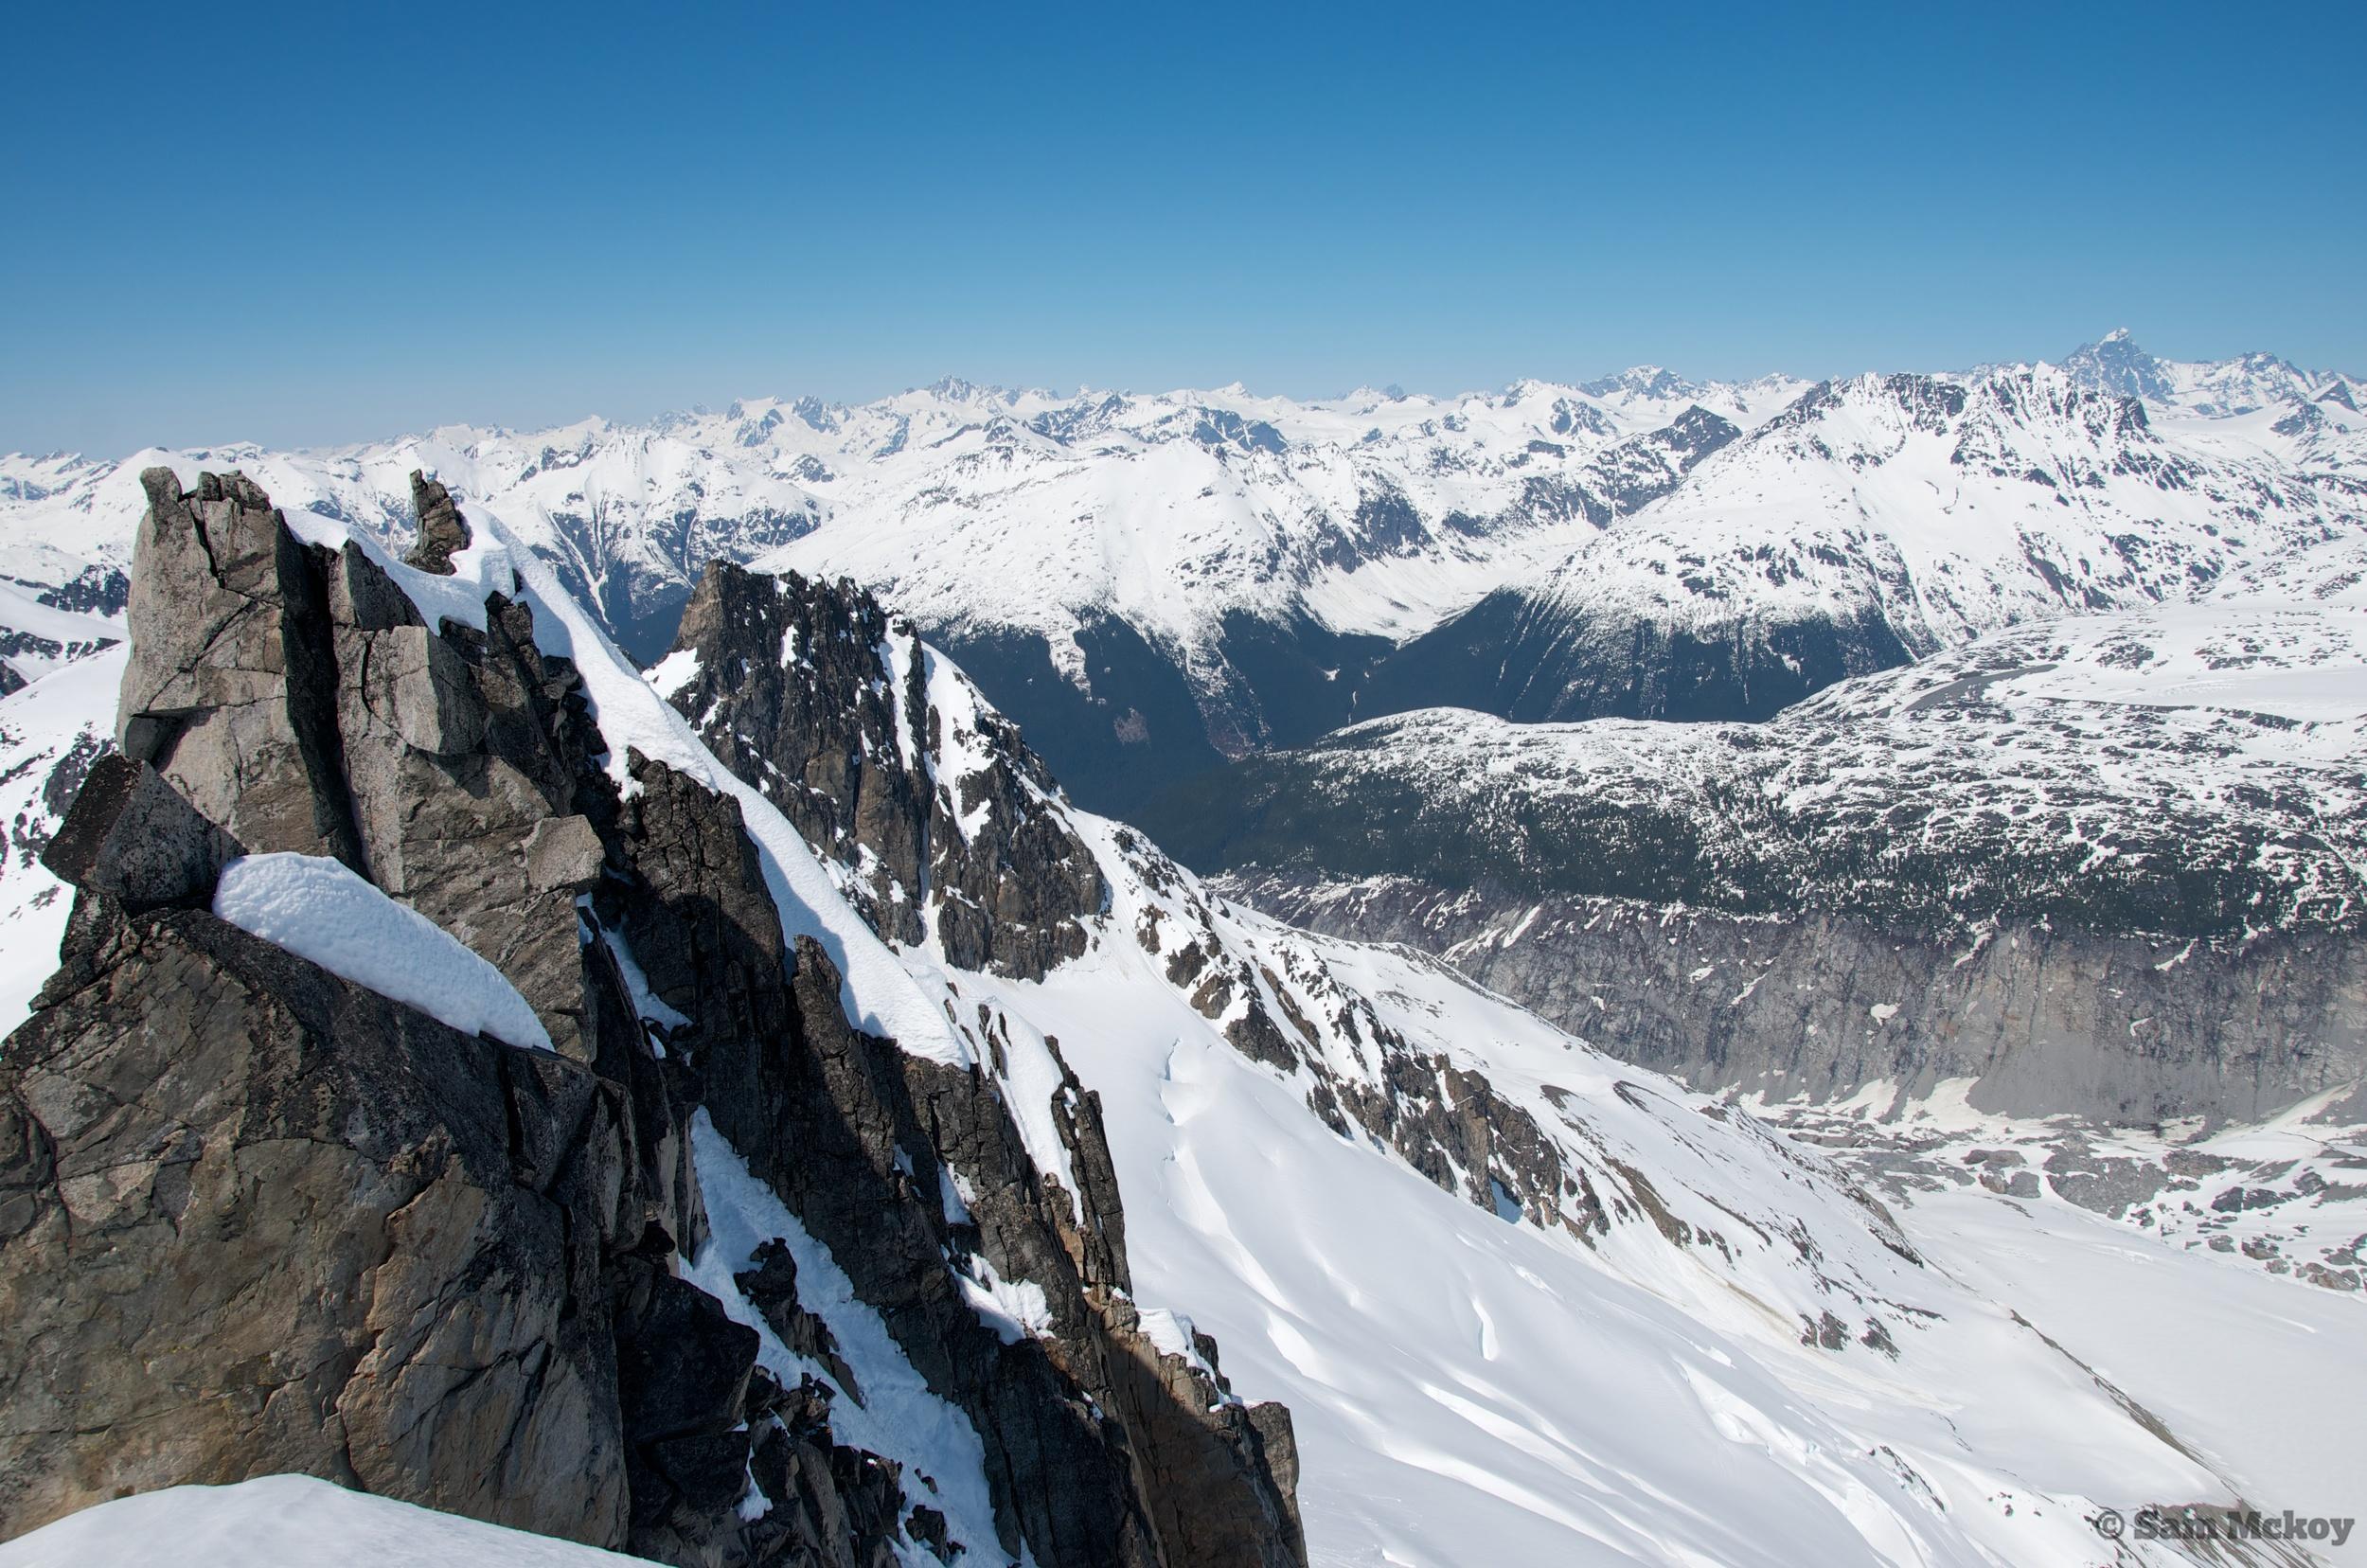 A view from the SE ridge of Pelletier peaks.